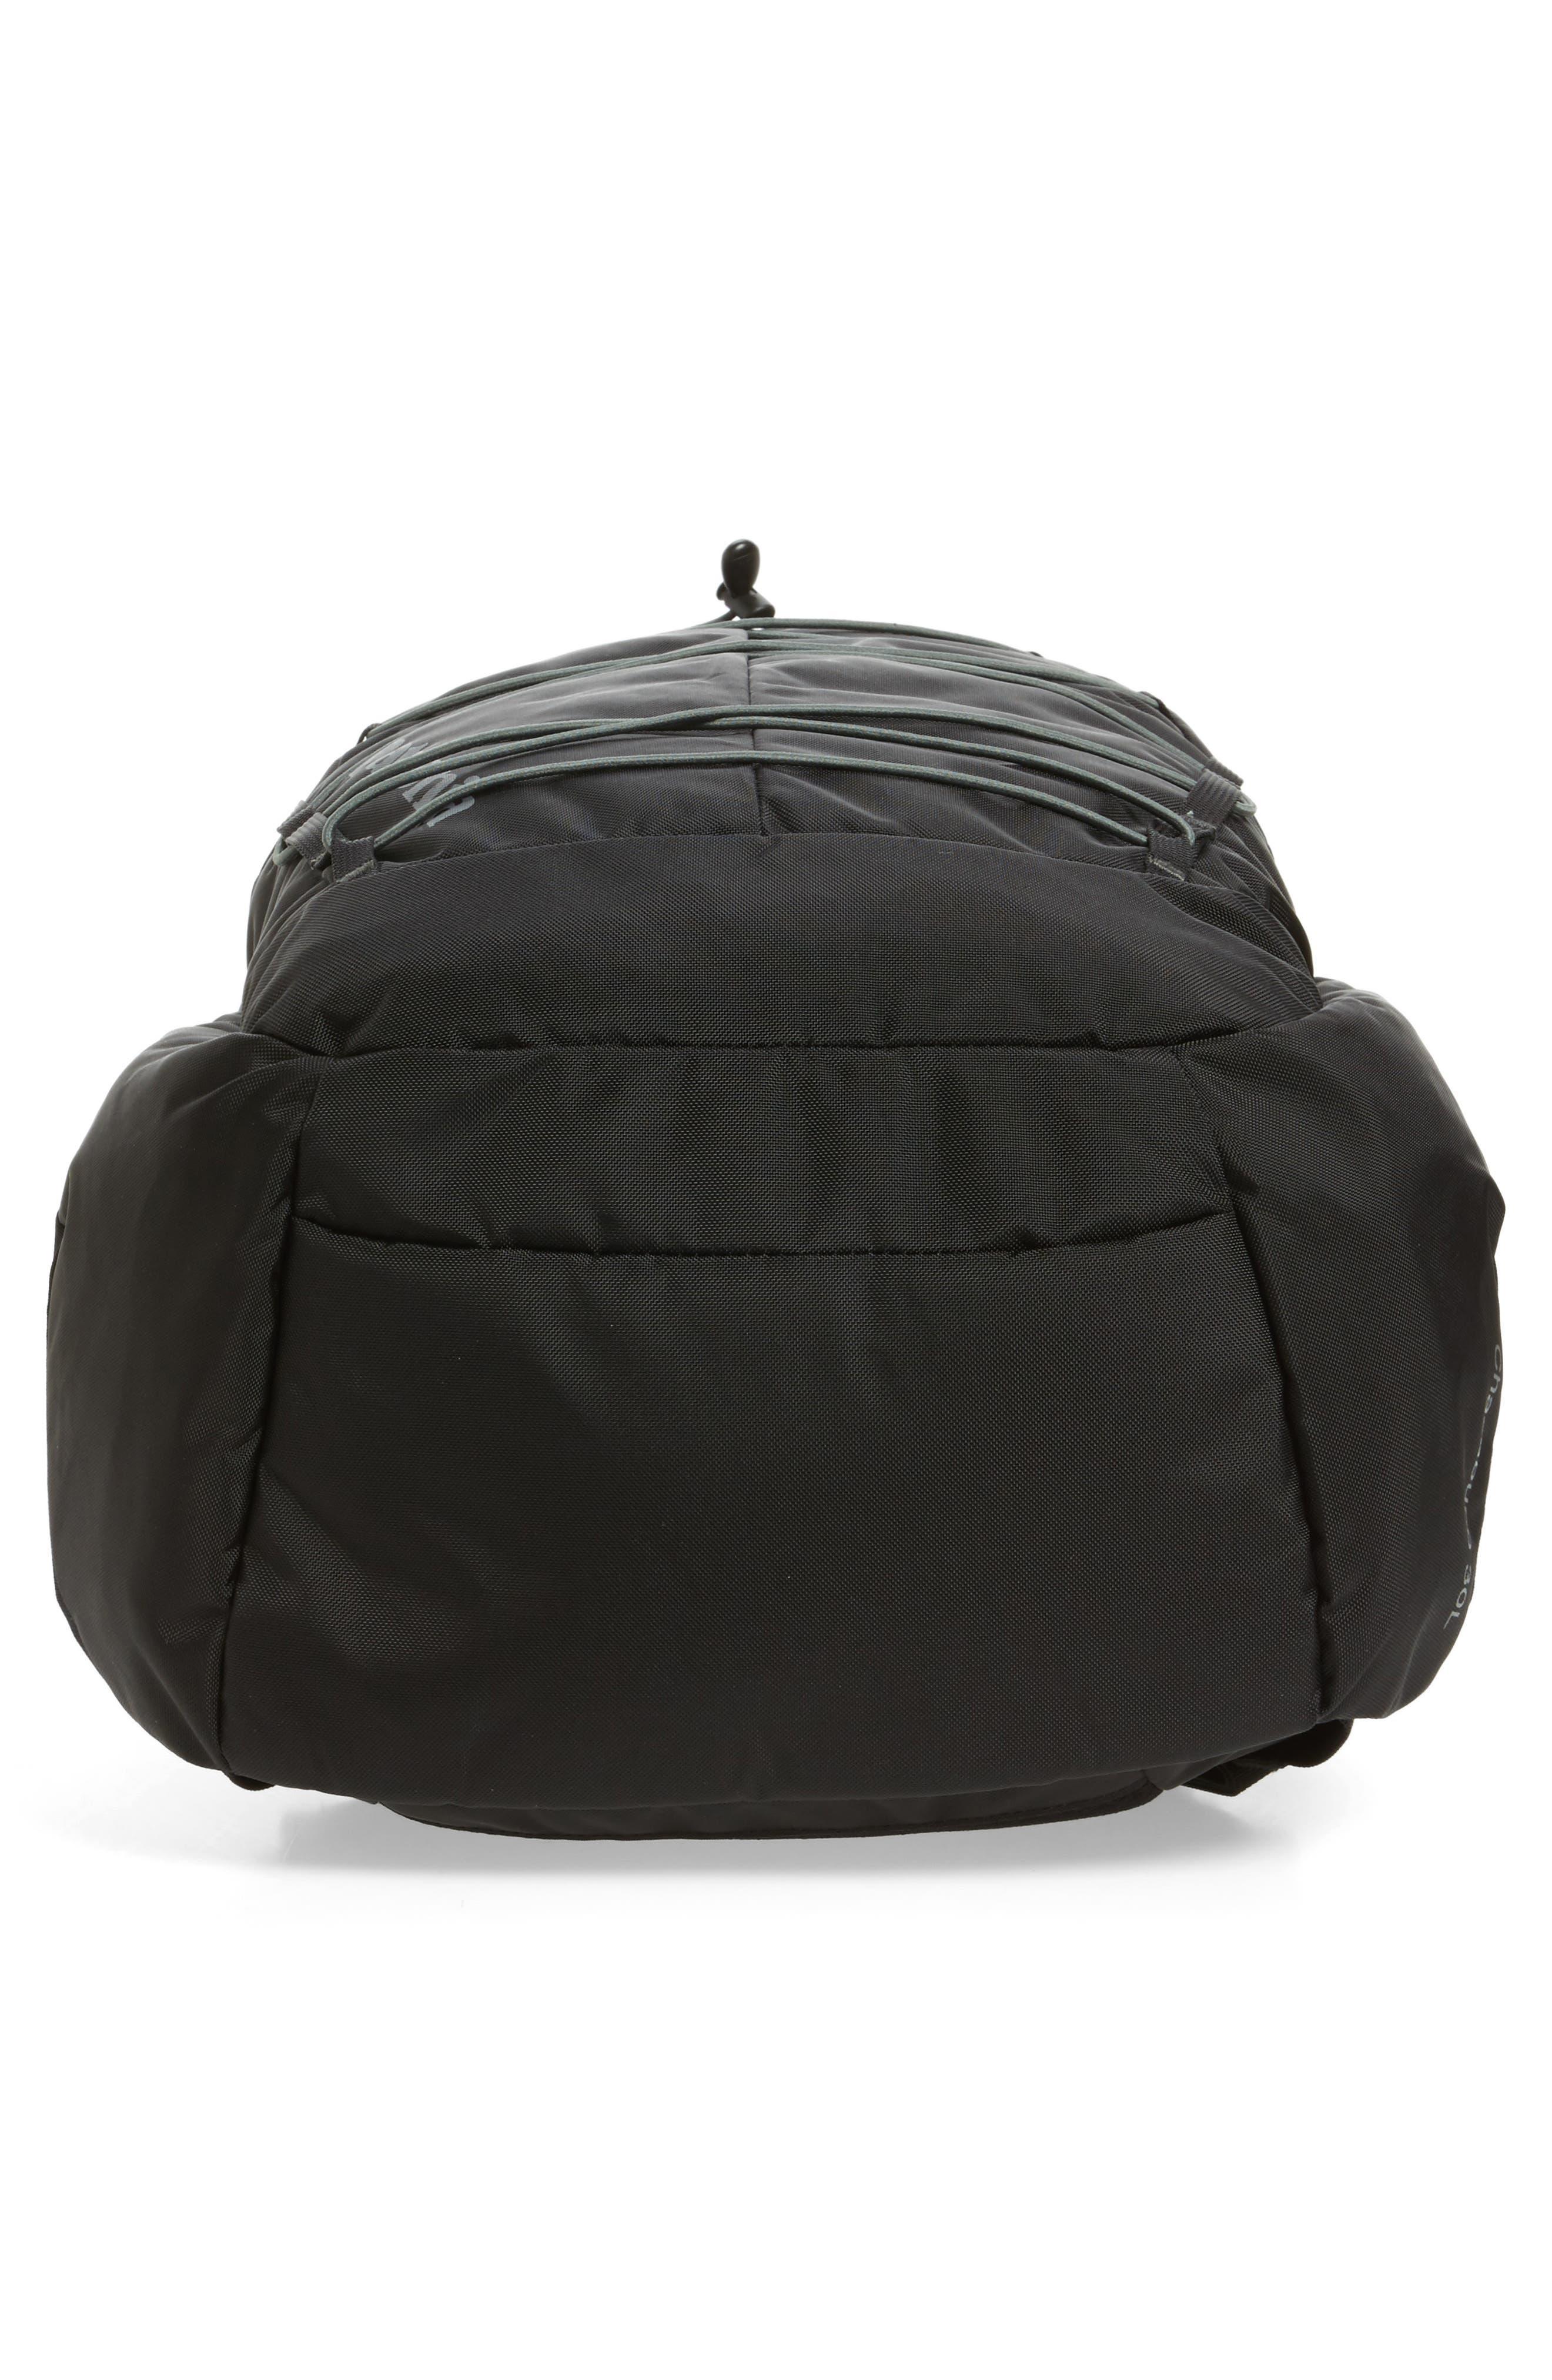 30L Chacabuco Backpack,                             Alternate thumbnail 6, color,                             BLACK